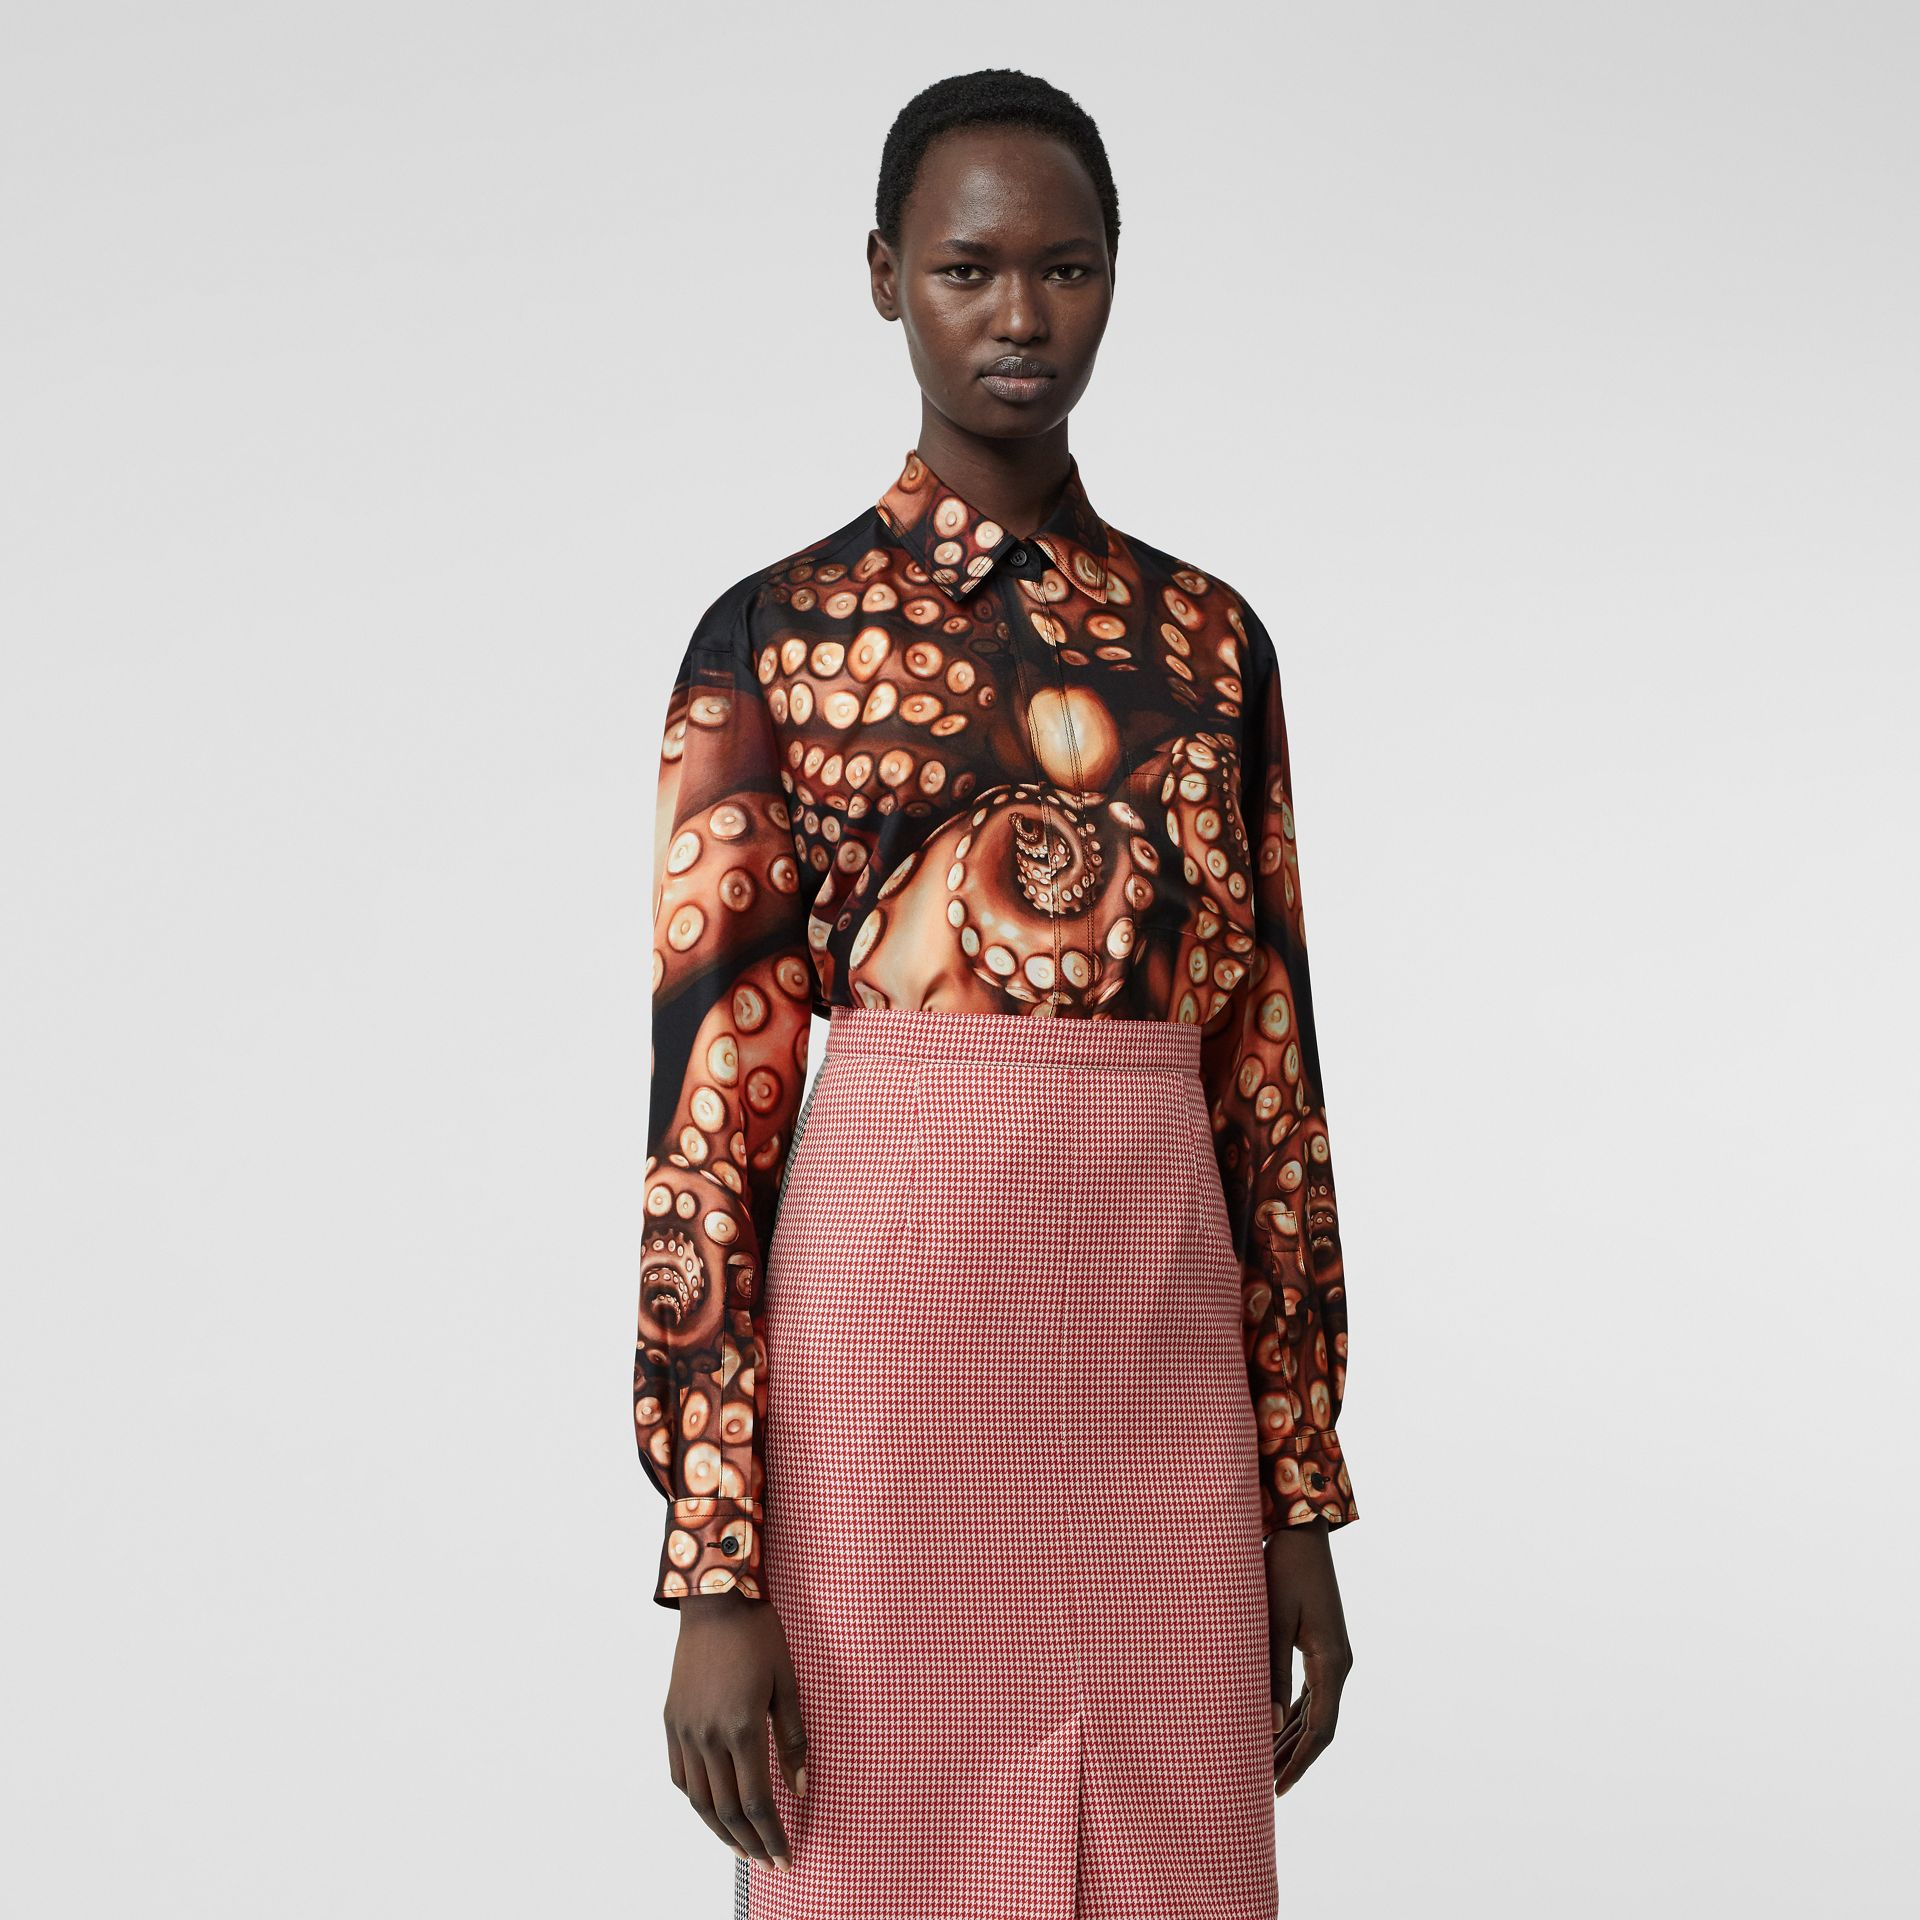 Oversize-Bluse aus Seidentwill mit Tintenfisch-Muster (Aprikosenrosa) - Damen | Burberry - Galerie-Bild 5